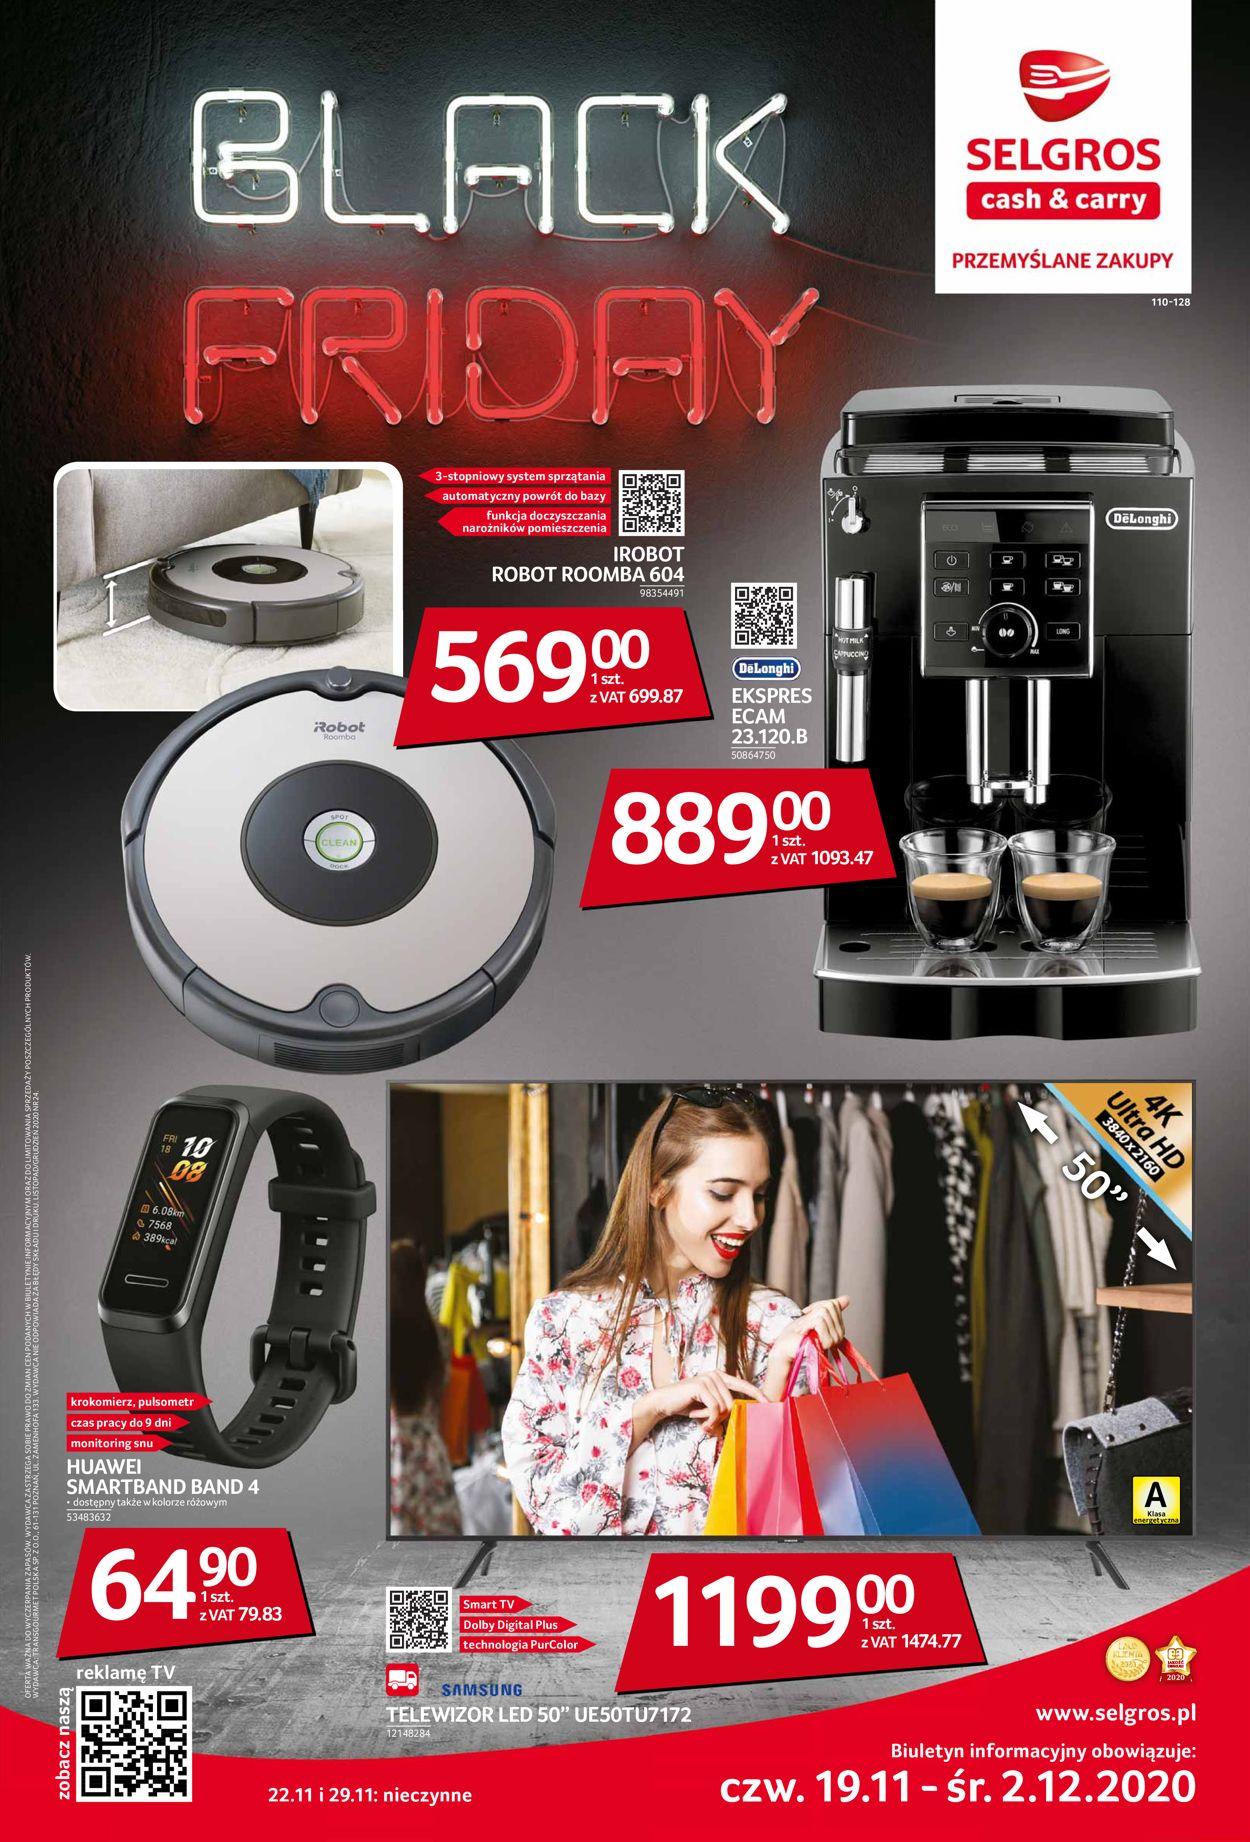 Gazetka promocyjna Selgros - Black Friday 2020 - 19.11-02.12.2020